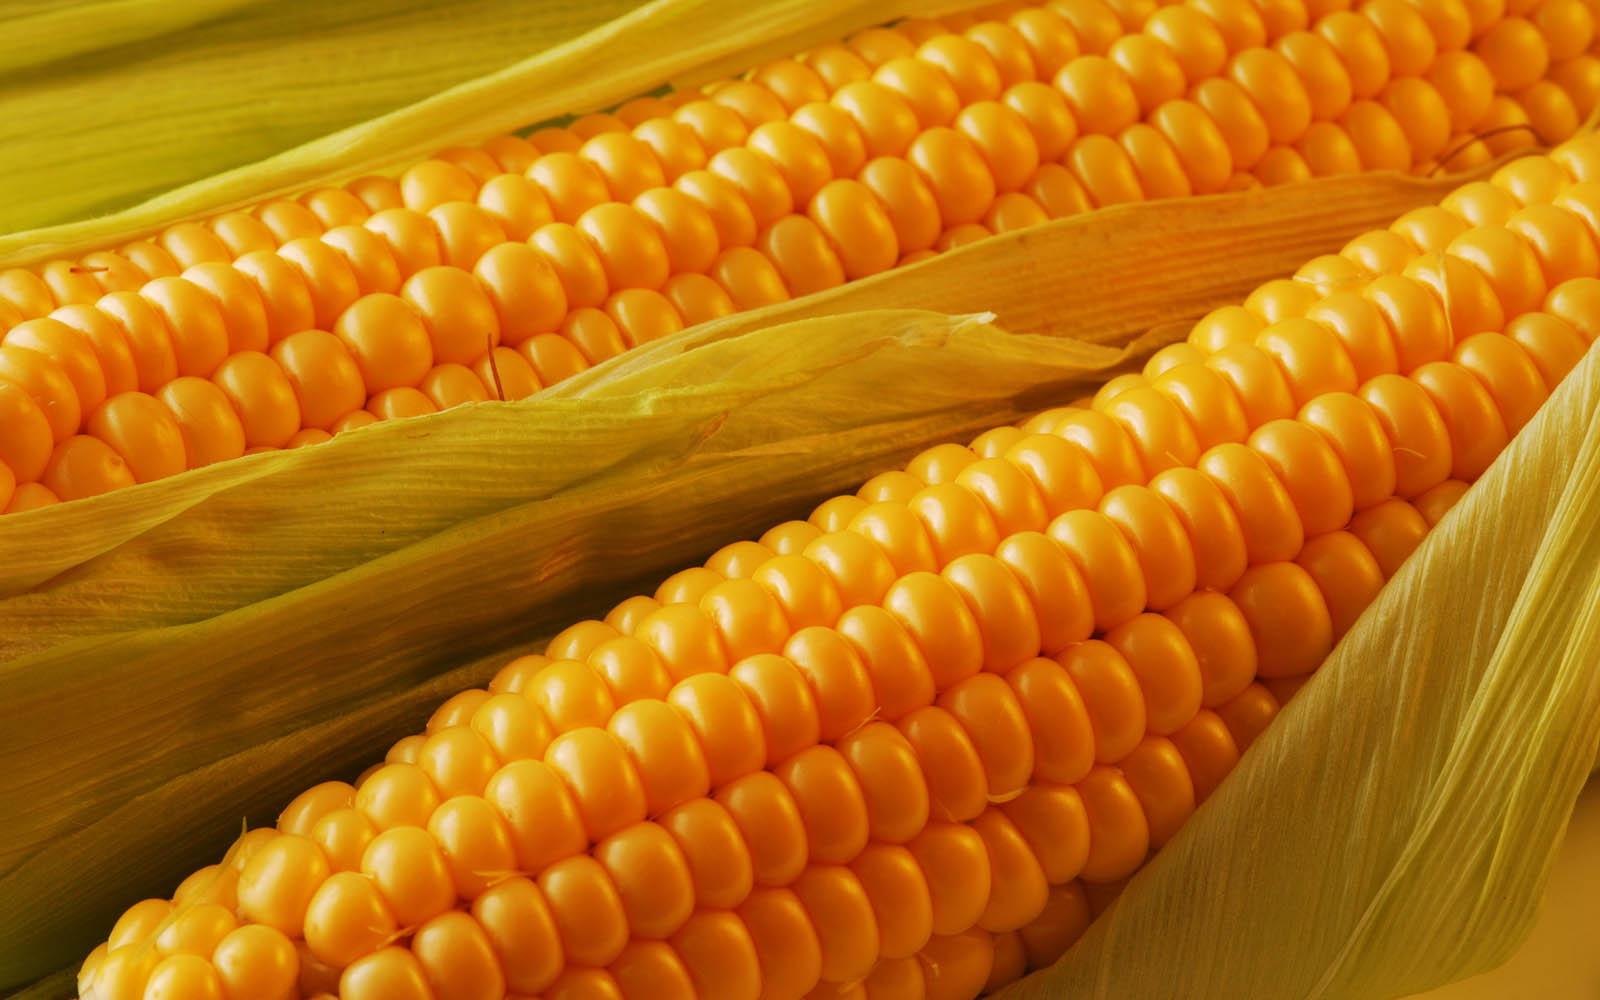 Maize Wallpaper For Presentation: Wallpapers: Fresh Corn